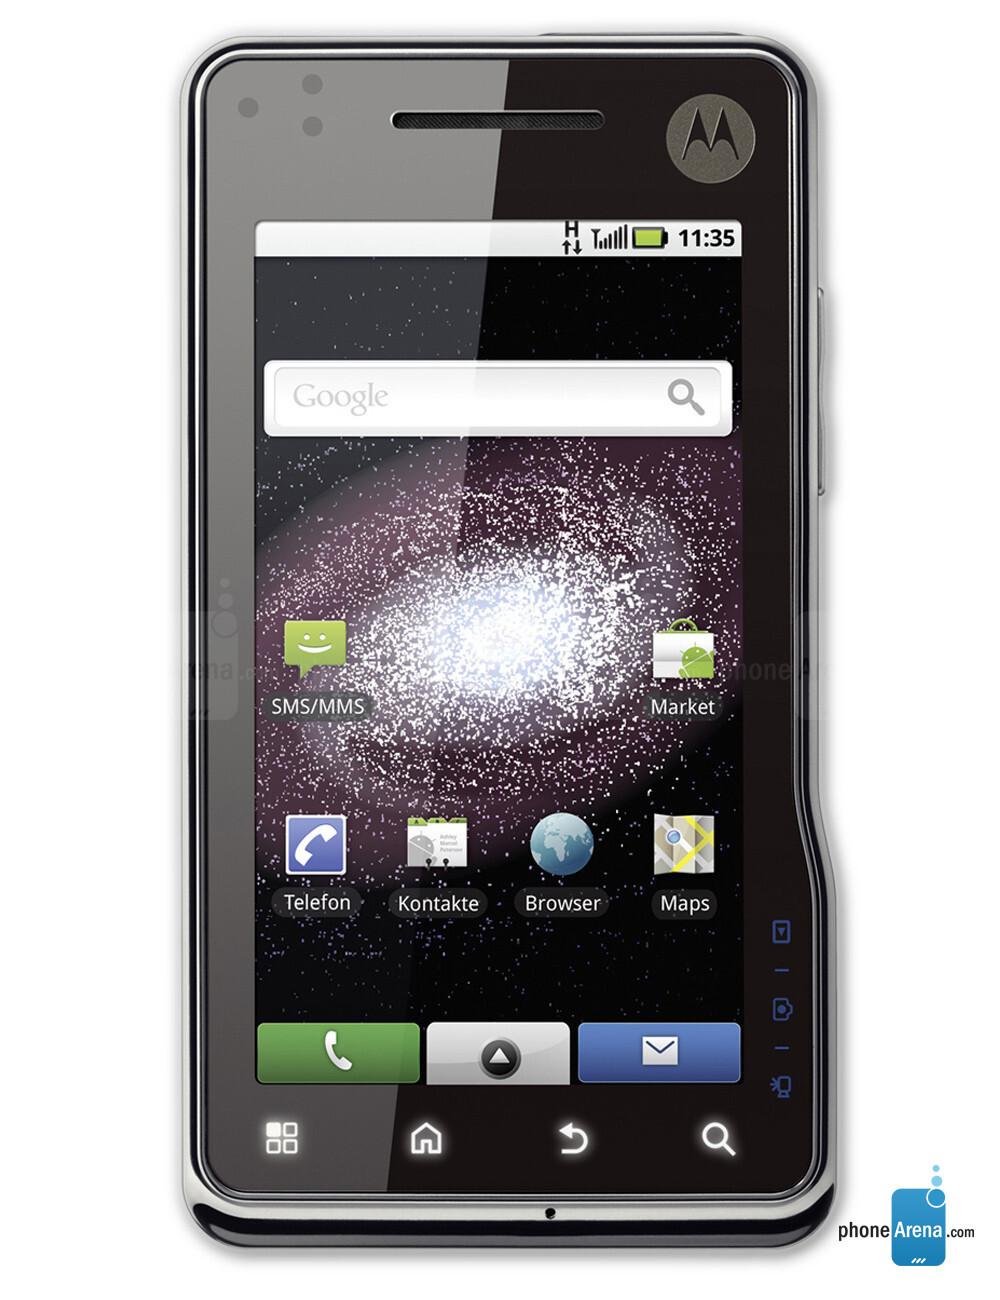 Motorola MILESTONE XT720 specs